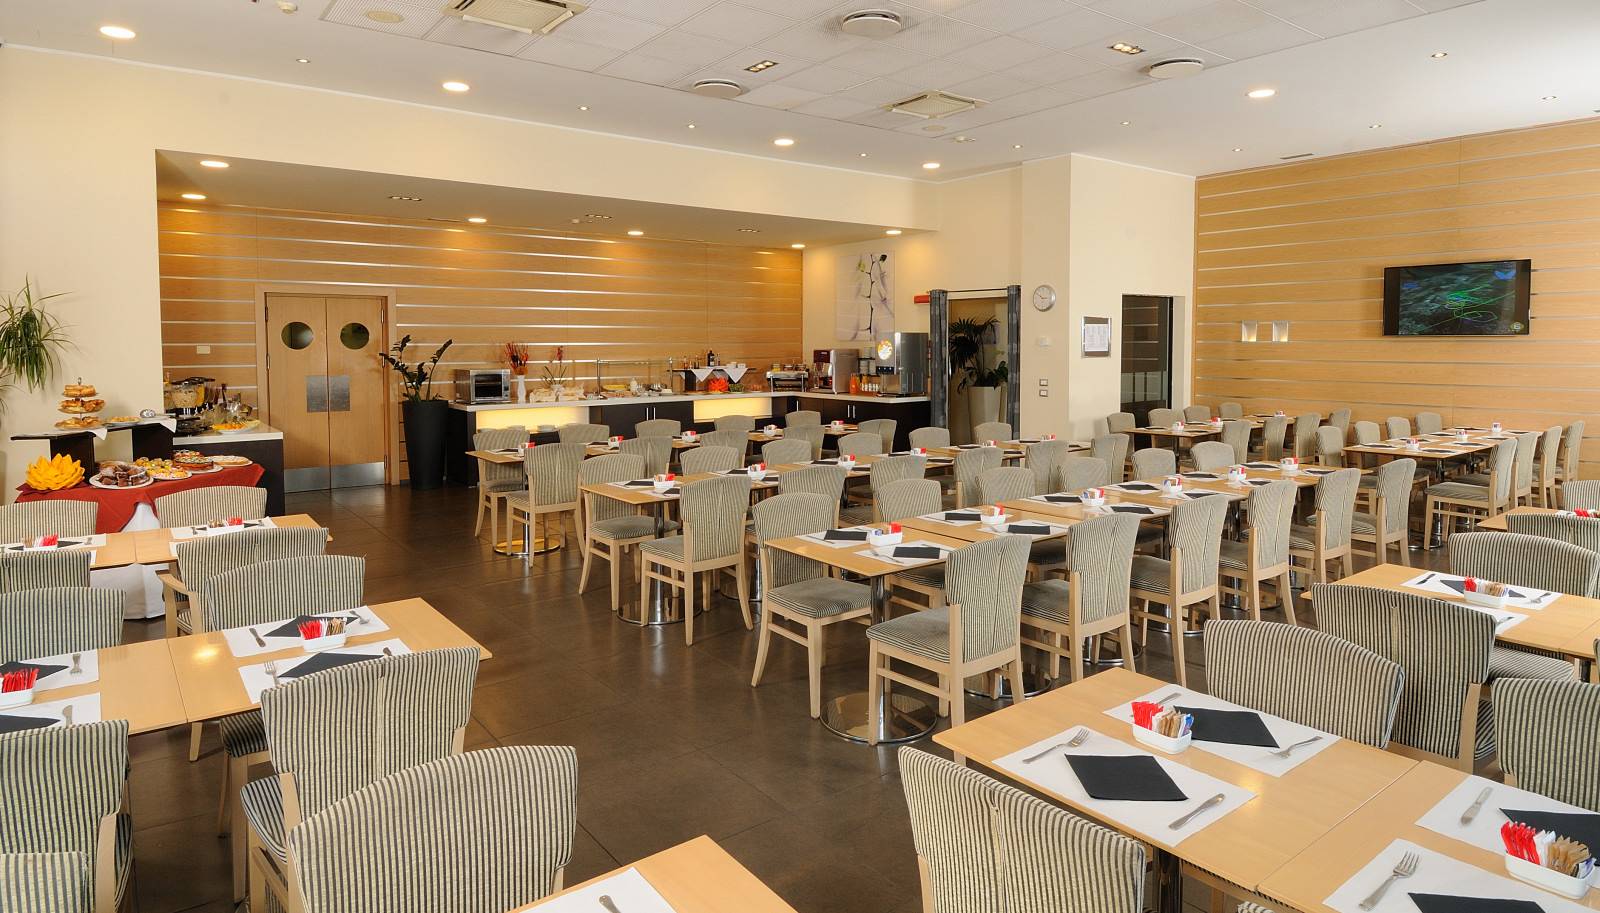 IH Hotels Milano Gioia - Breakfast room